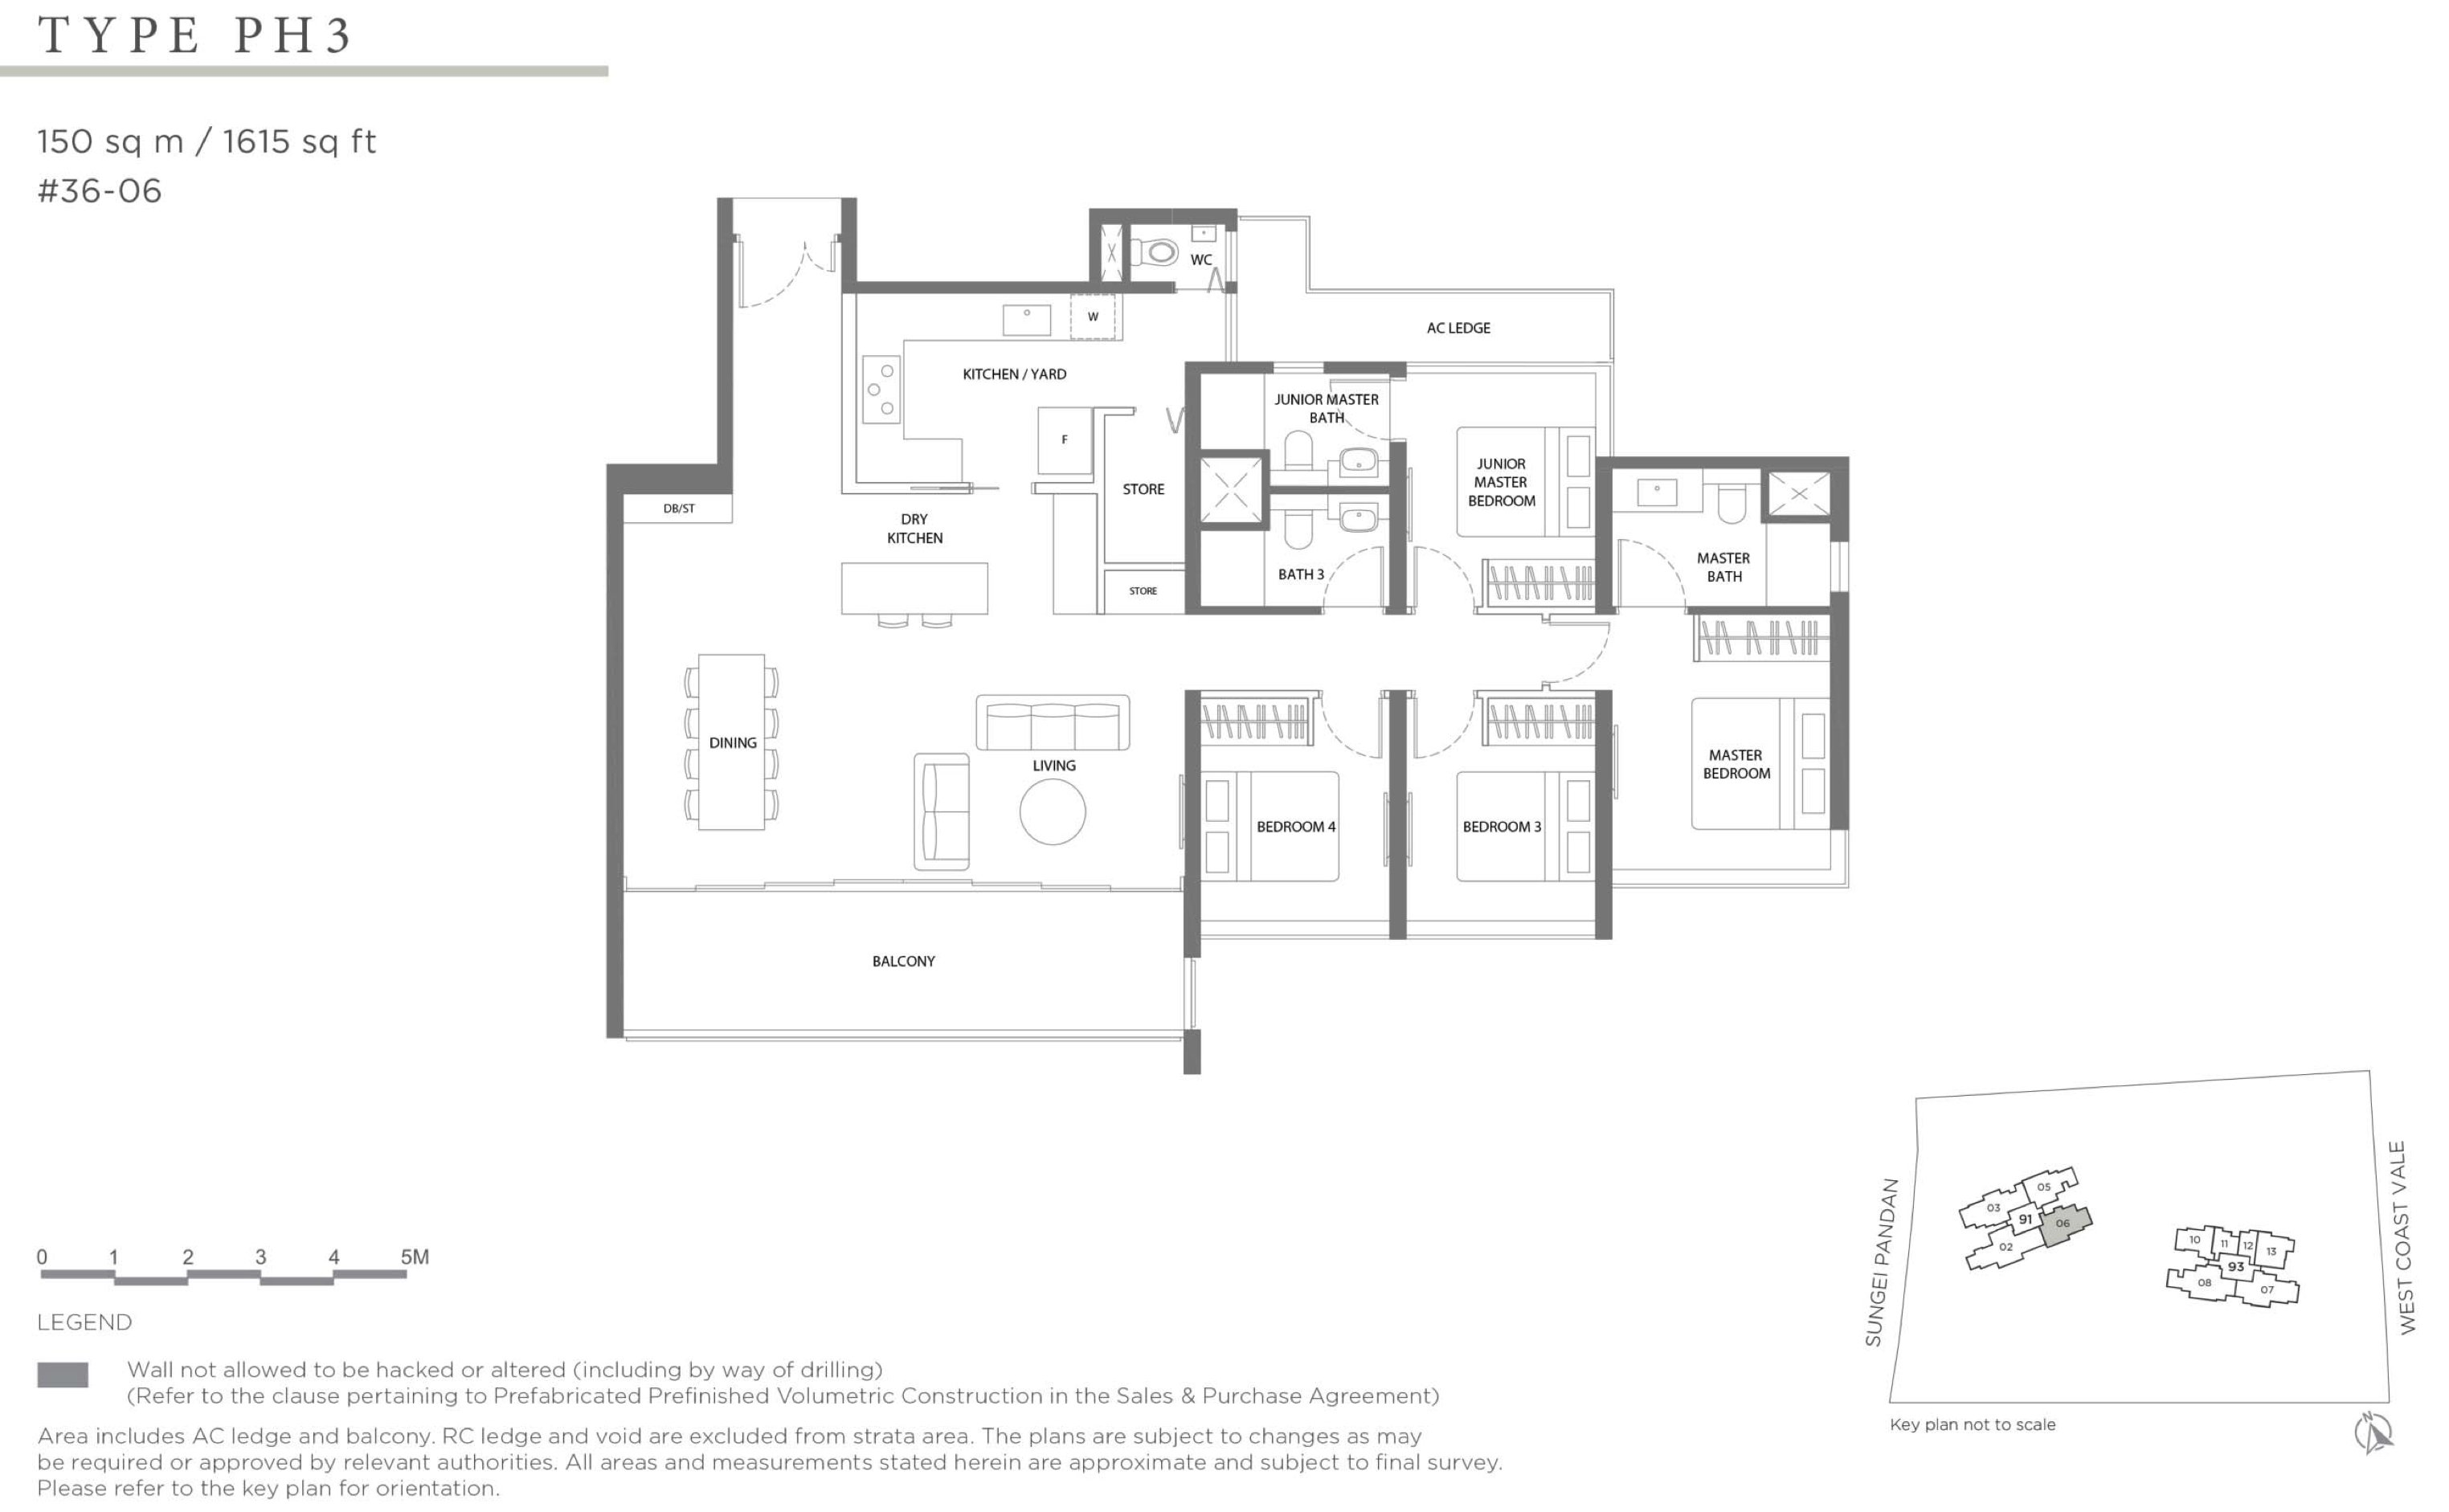 Twin VEW 4 bedroom big living balcony penthouse PH3 floor plan